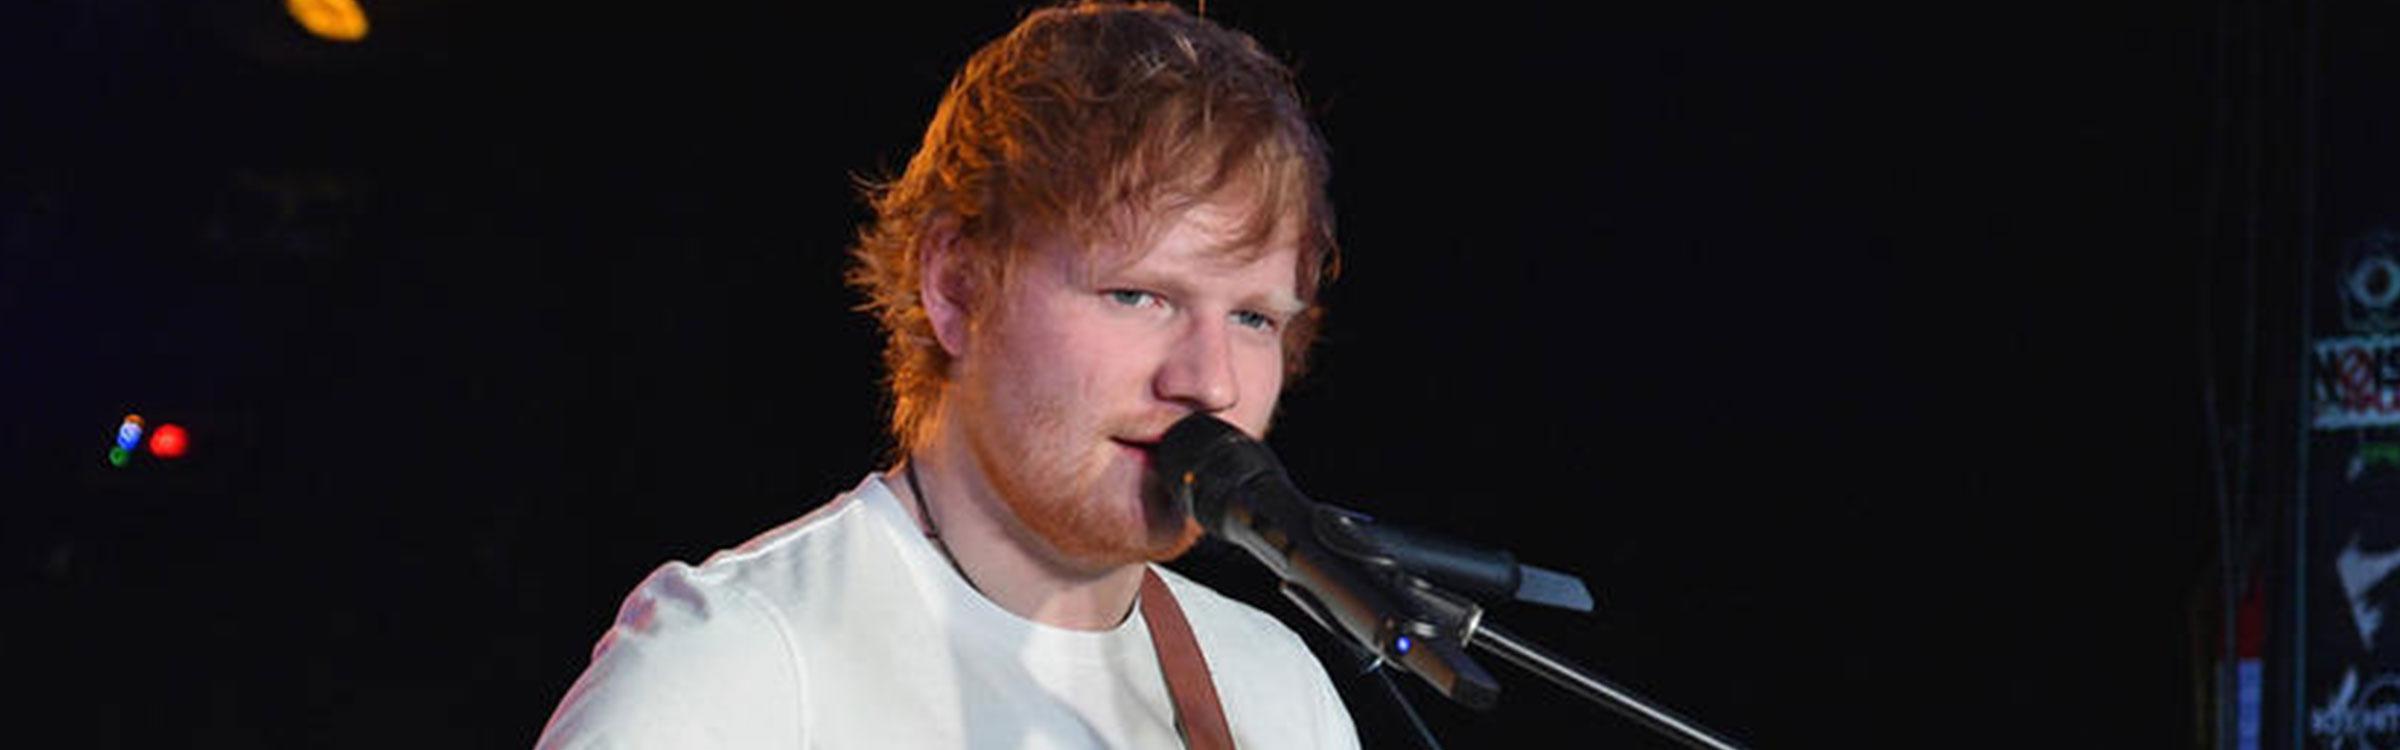 Ed sheeran boyband header2